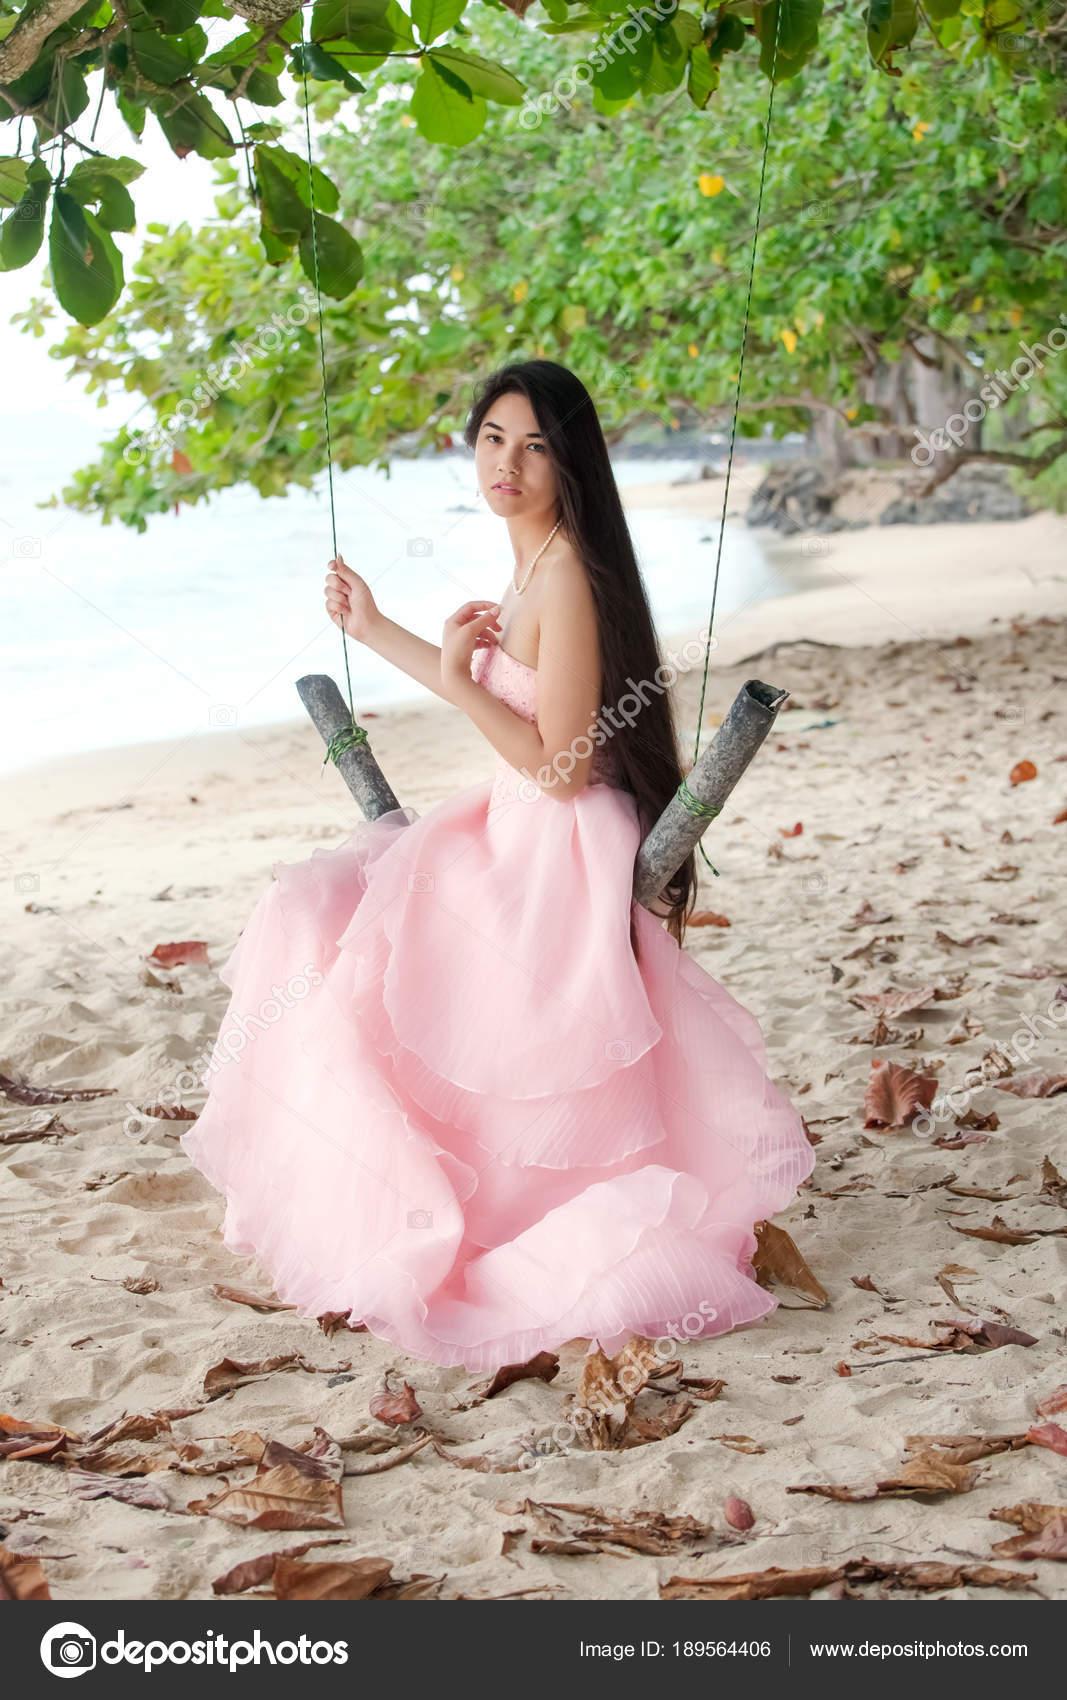 Junge Frau trägt lange rosa Kleid am Strand von Hawaii — Stockfoto ...